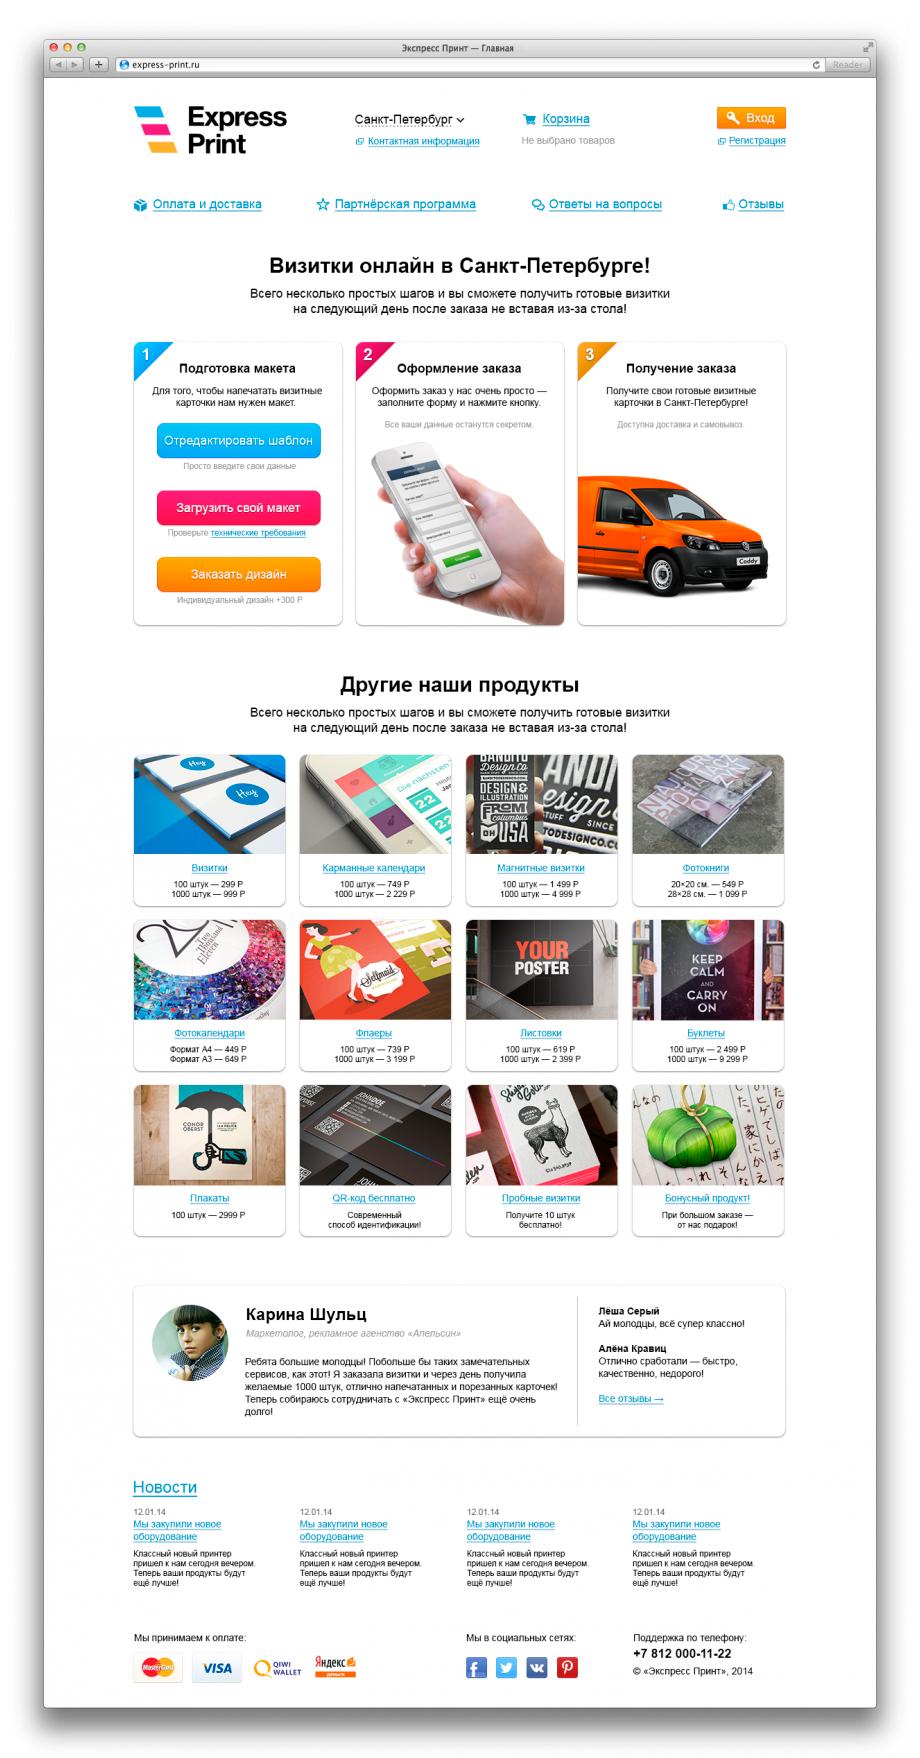 express_print_main_portfolio